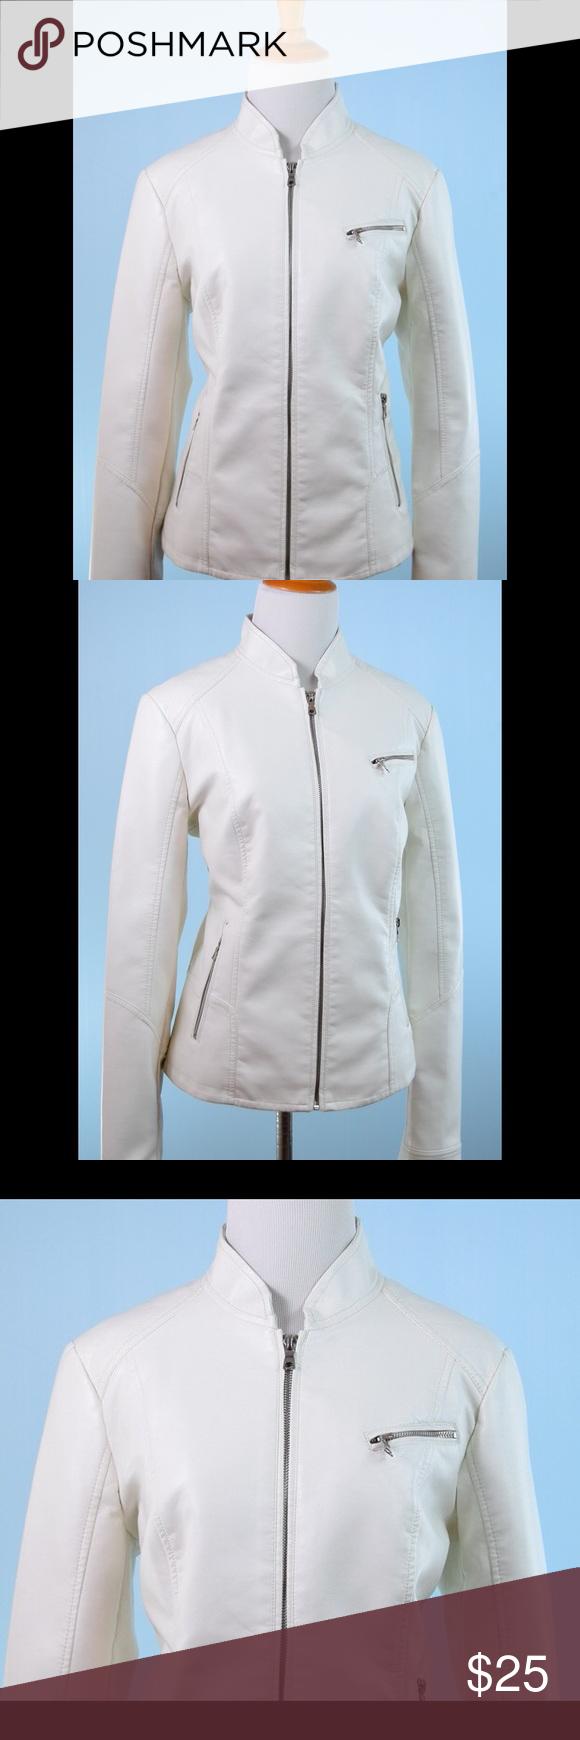 ROZ & ALI off white faux leather jacket Medium (With